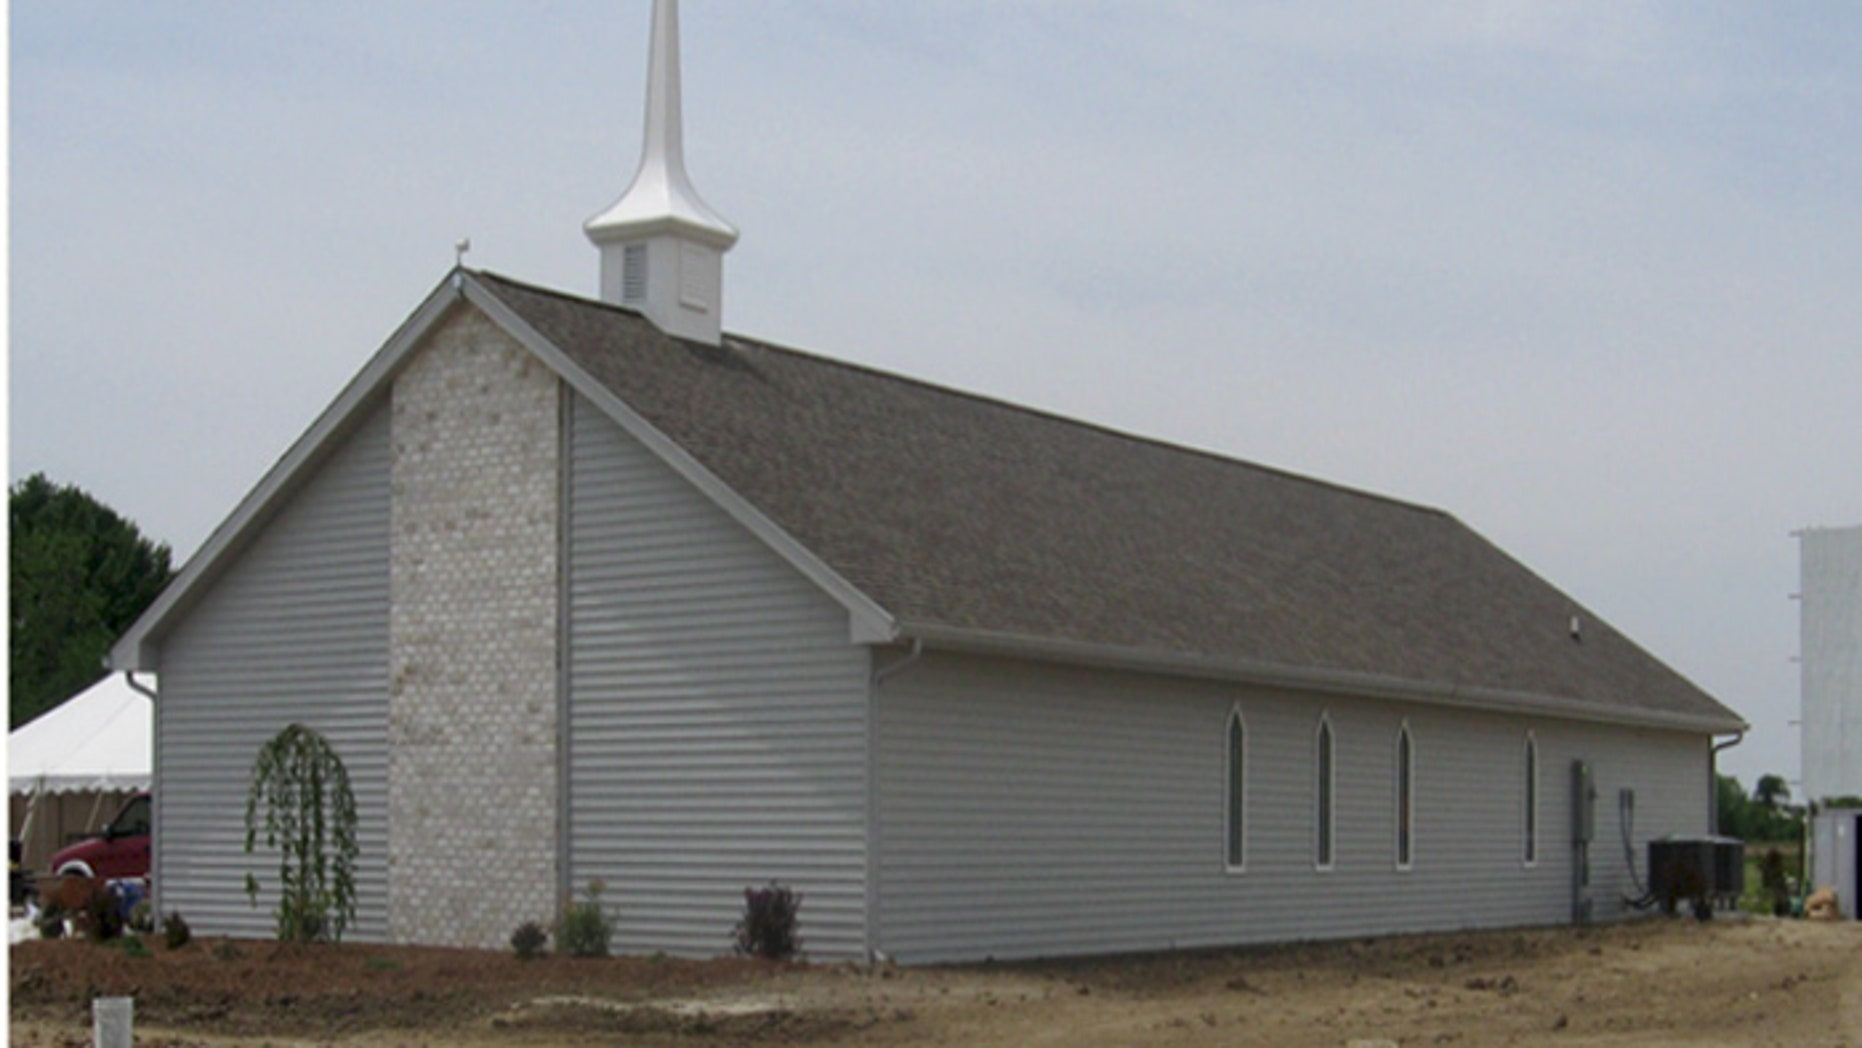 Faithful volunteers build church in one day in Iowa | Fox News